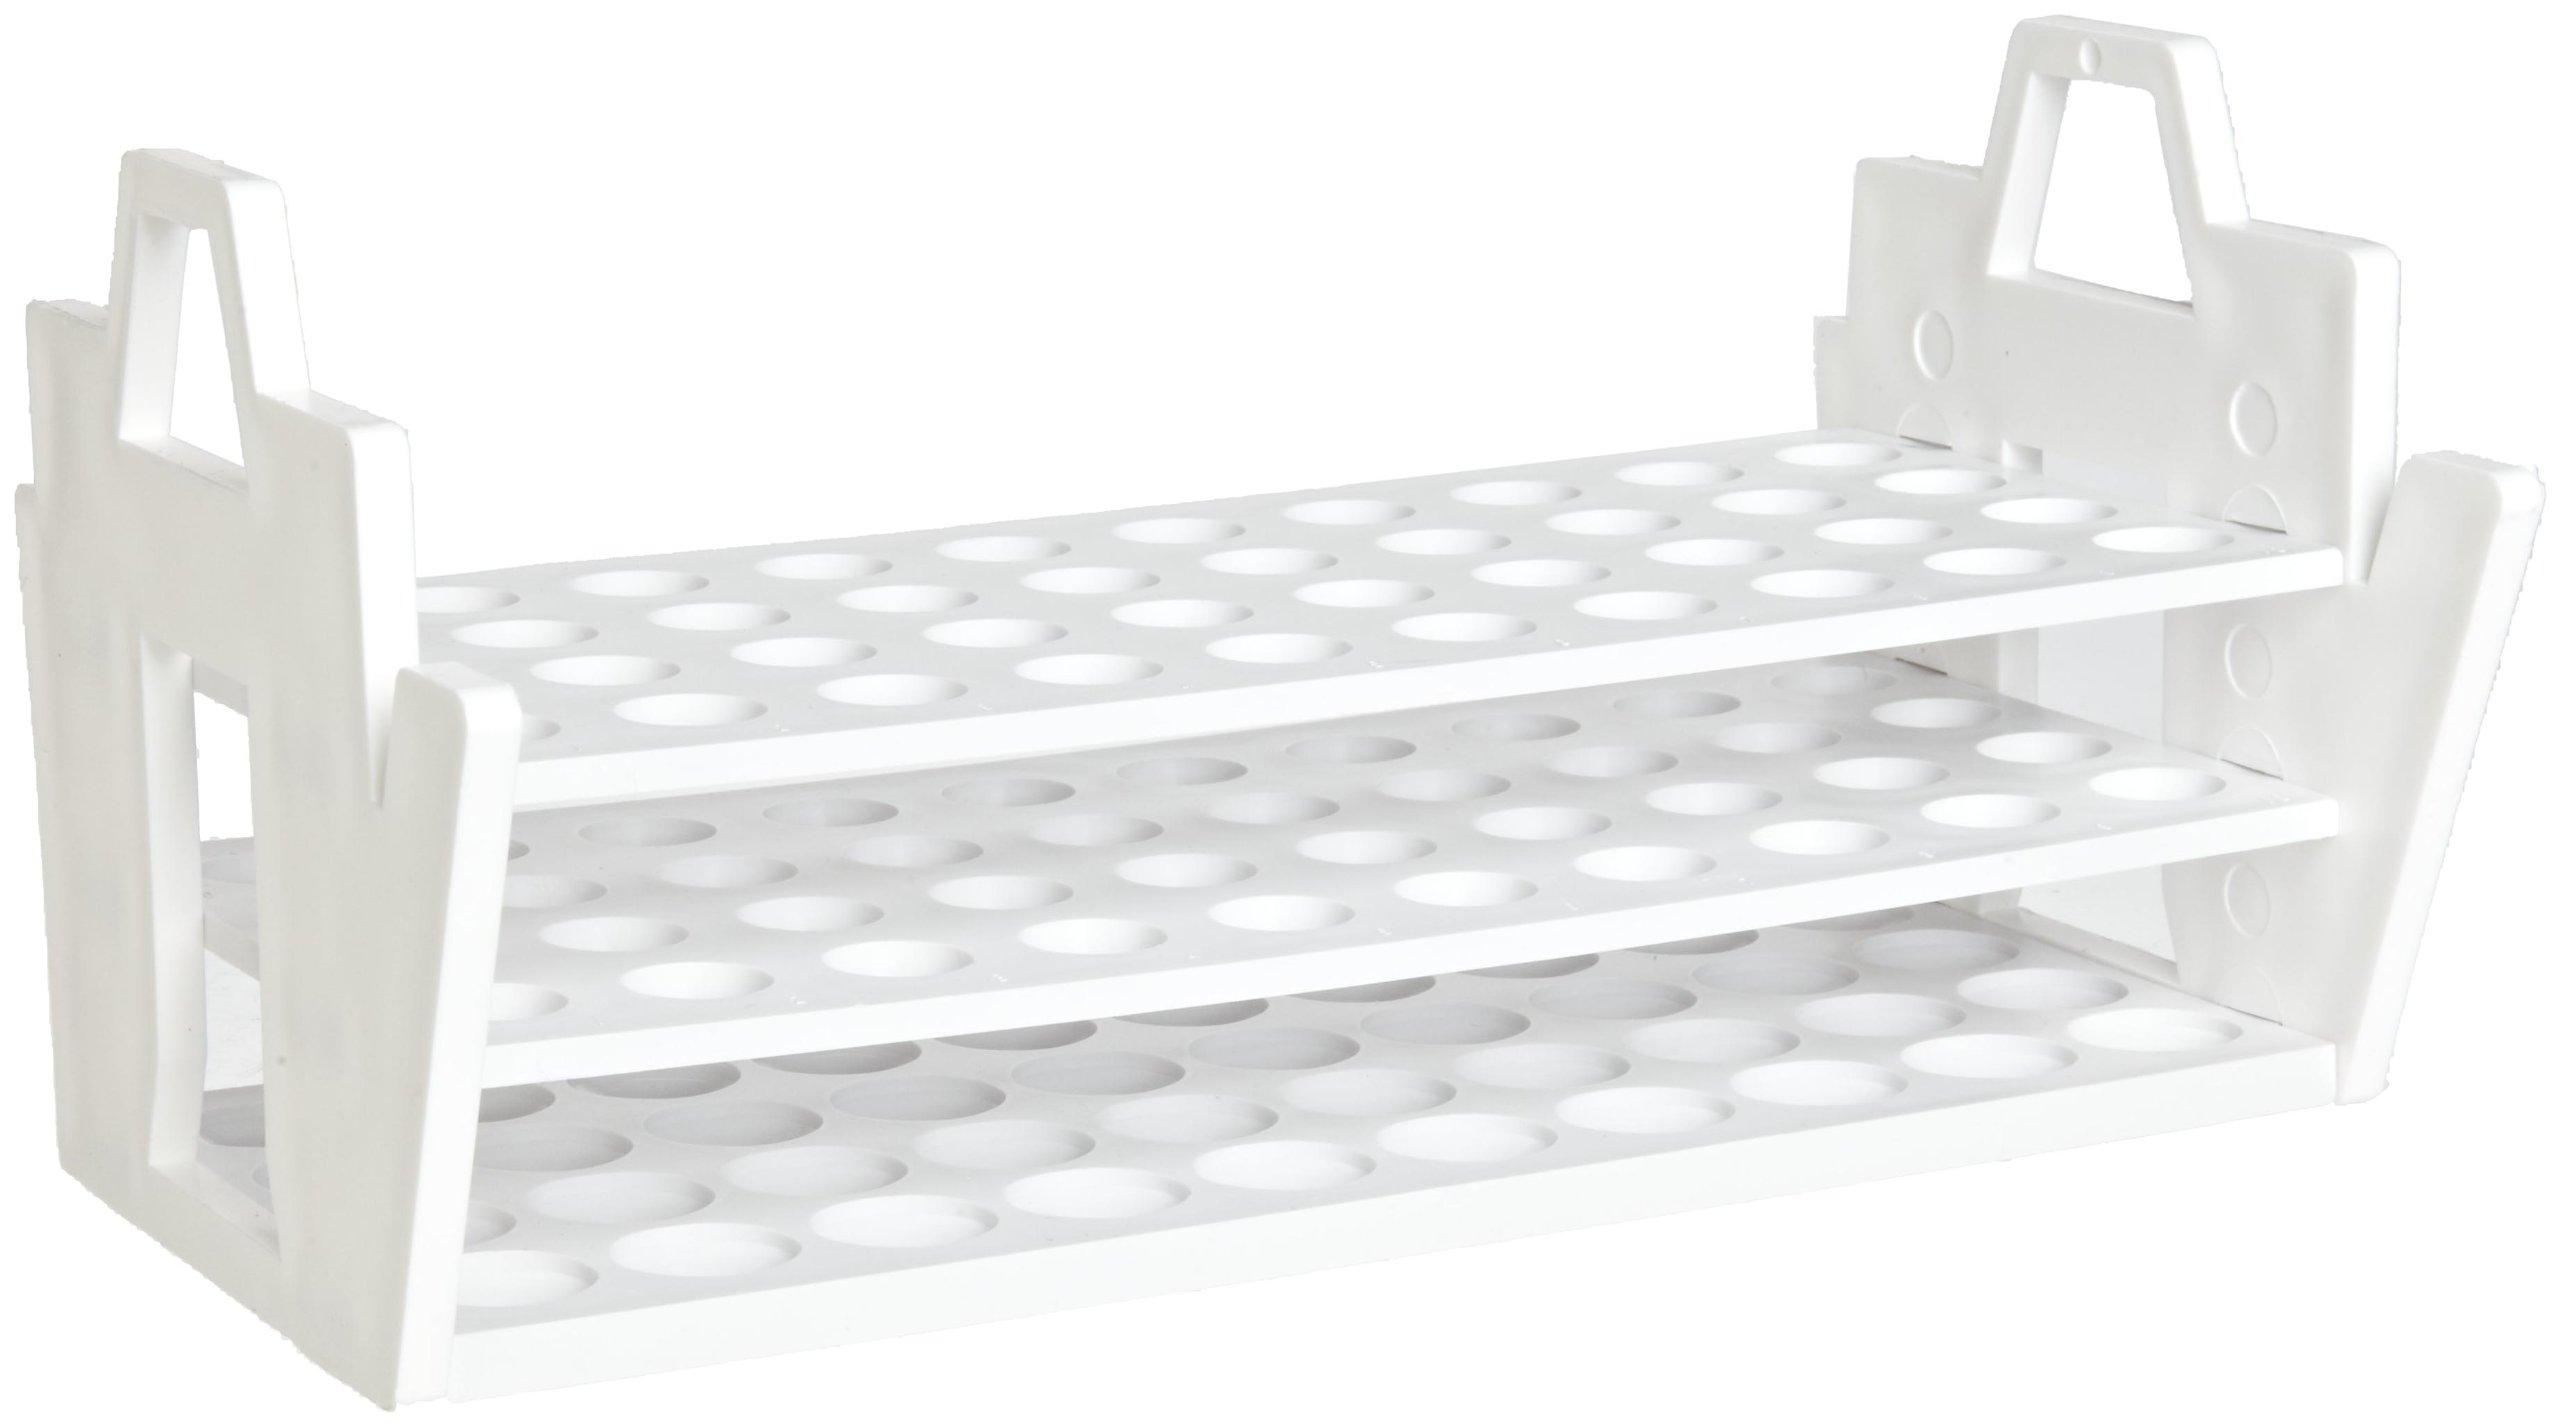 Bel-Art F18890-0016 Slant Rack; 13-16mm, 40 Places, 10¹/₂ x 6 x 5¹/₈ in., Polypropylene